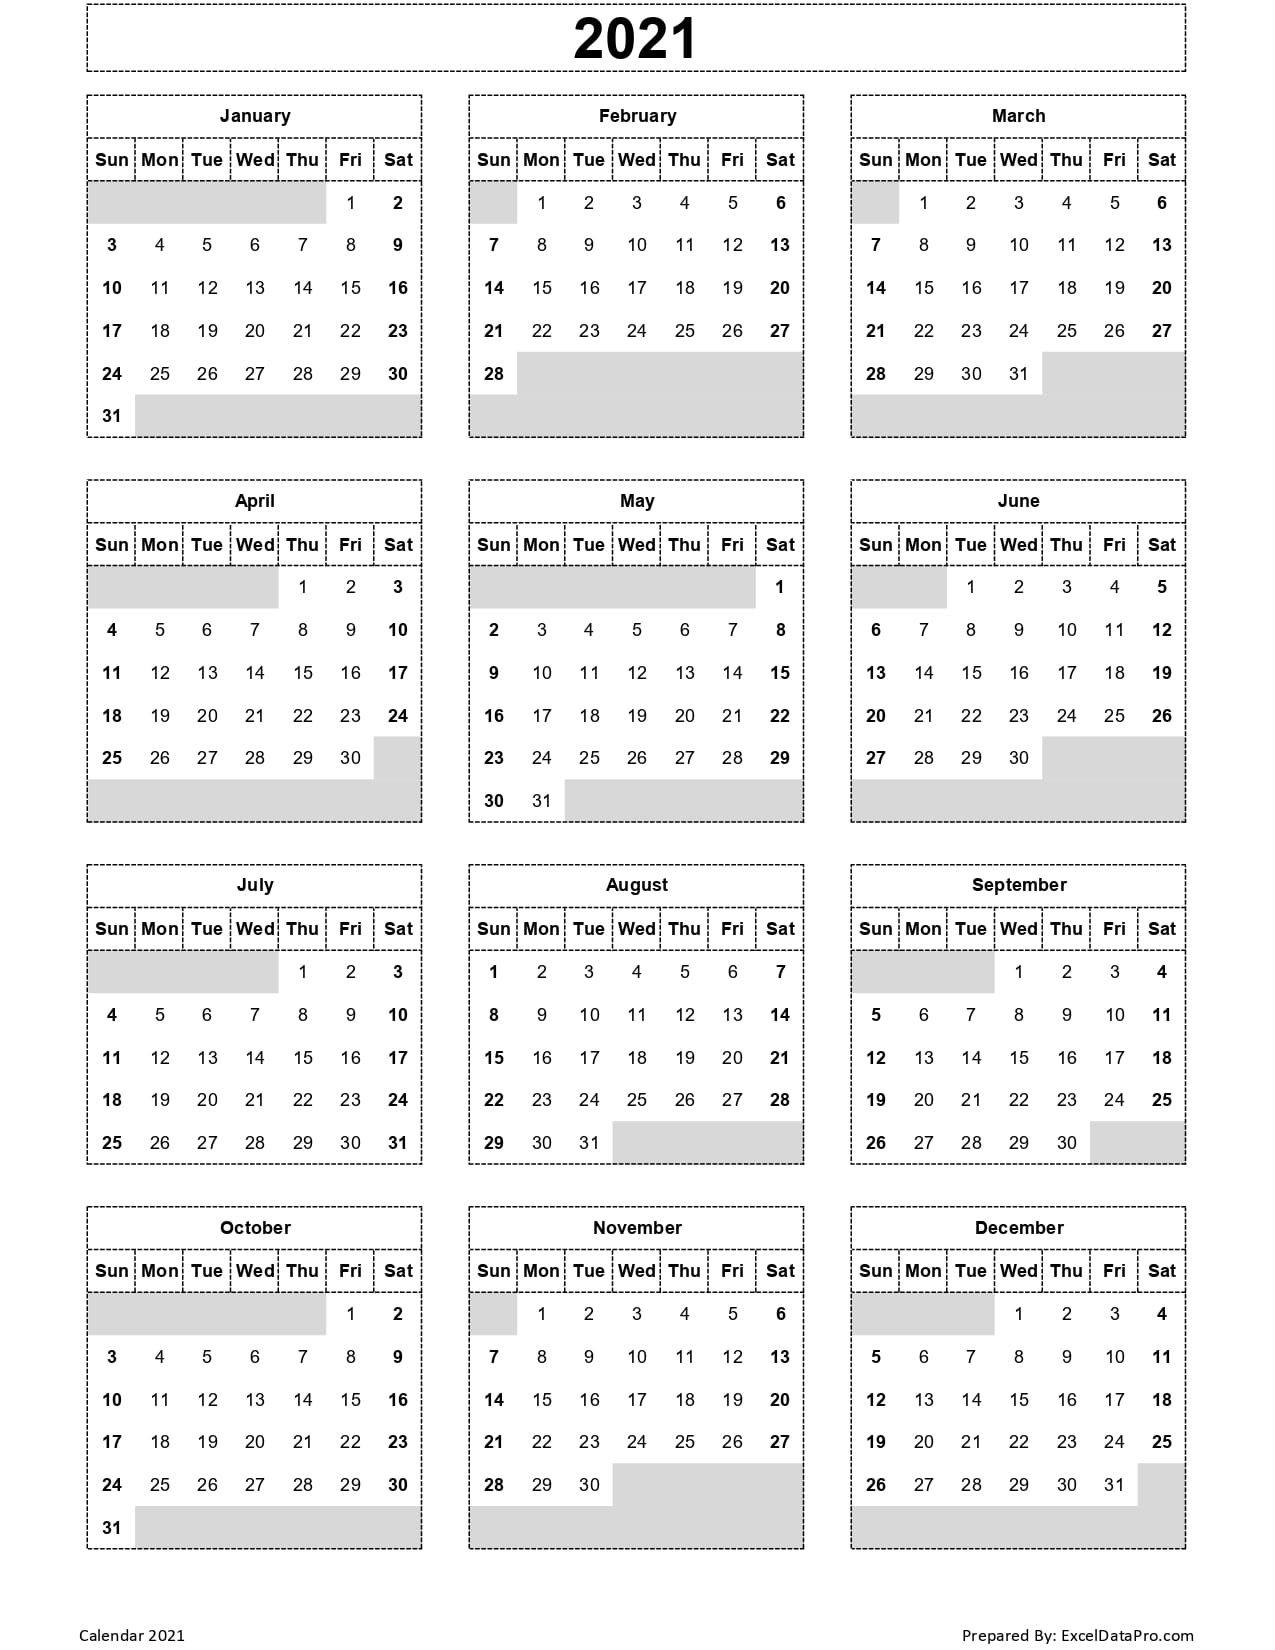 Calendar 2021 Excel Templates, Printable Pdfs & Images - Exceldatapro regarding 2021 Printable Full Year Calendar Image